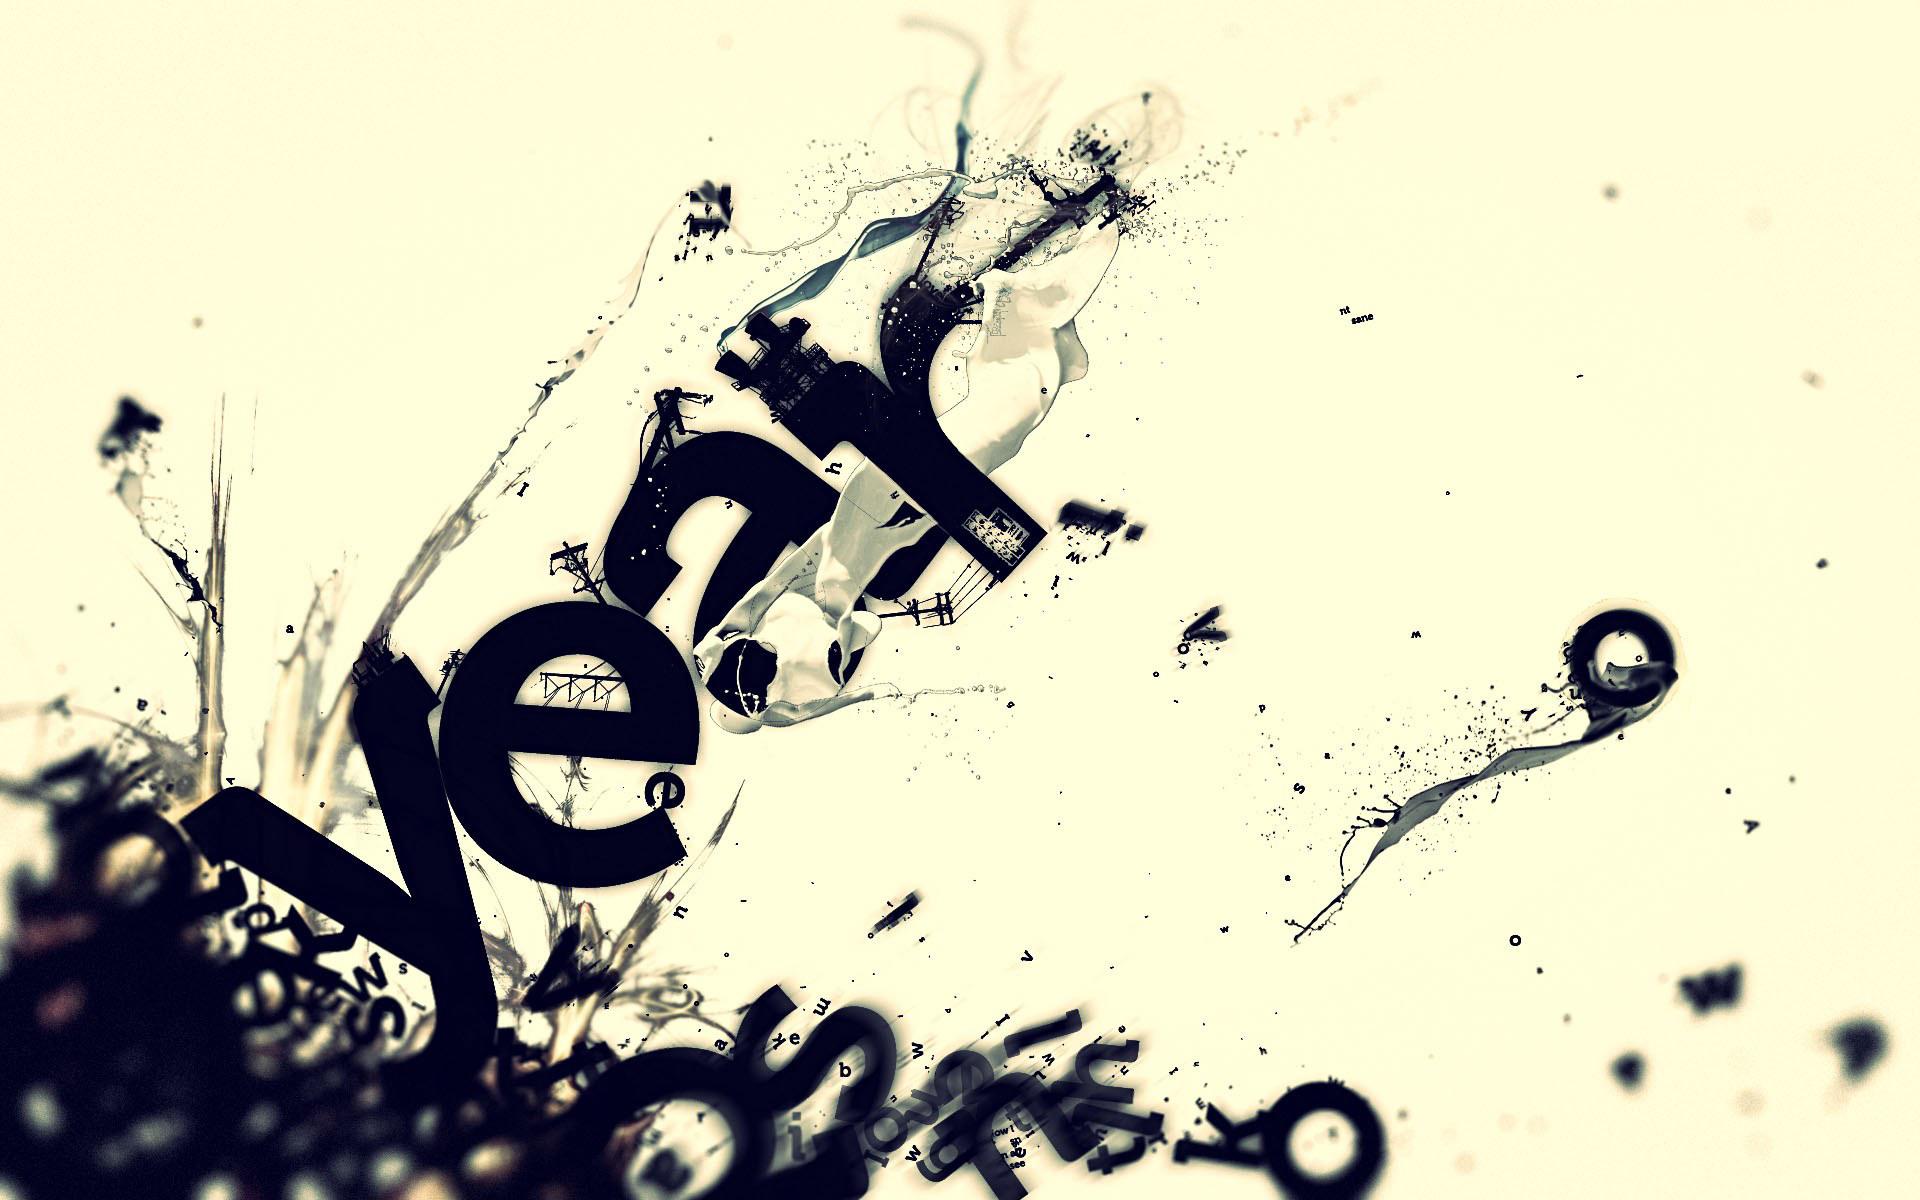 typography design tutorial creative art watercolor hd wallpaper 1920x1200